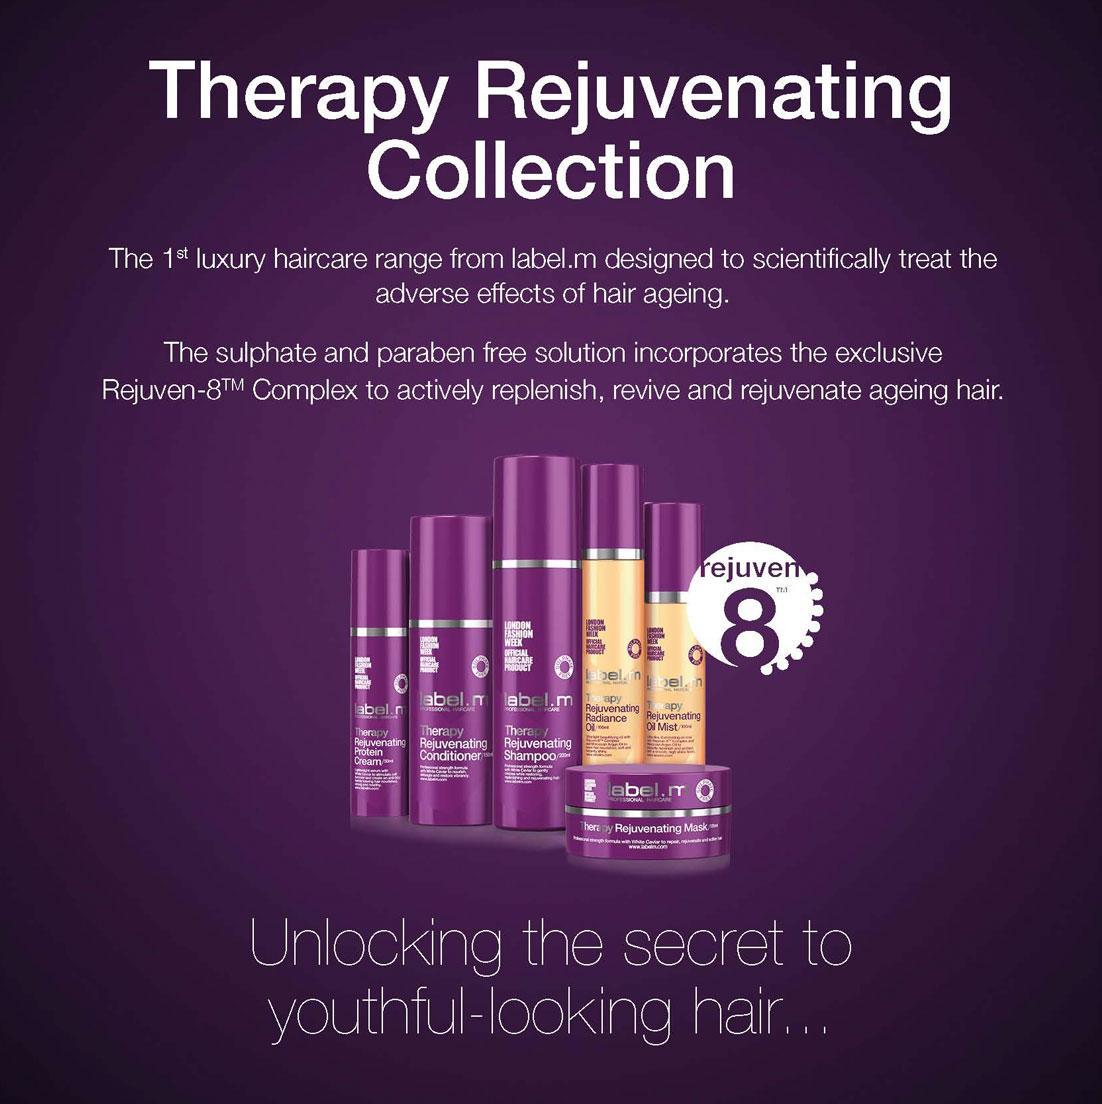 587.9-label-m-therapy-rejuvenating-1-pg-34.jpg